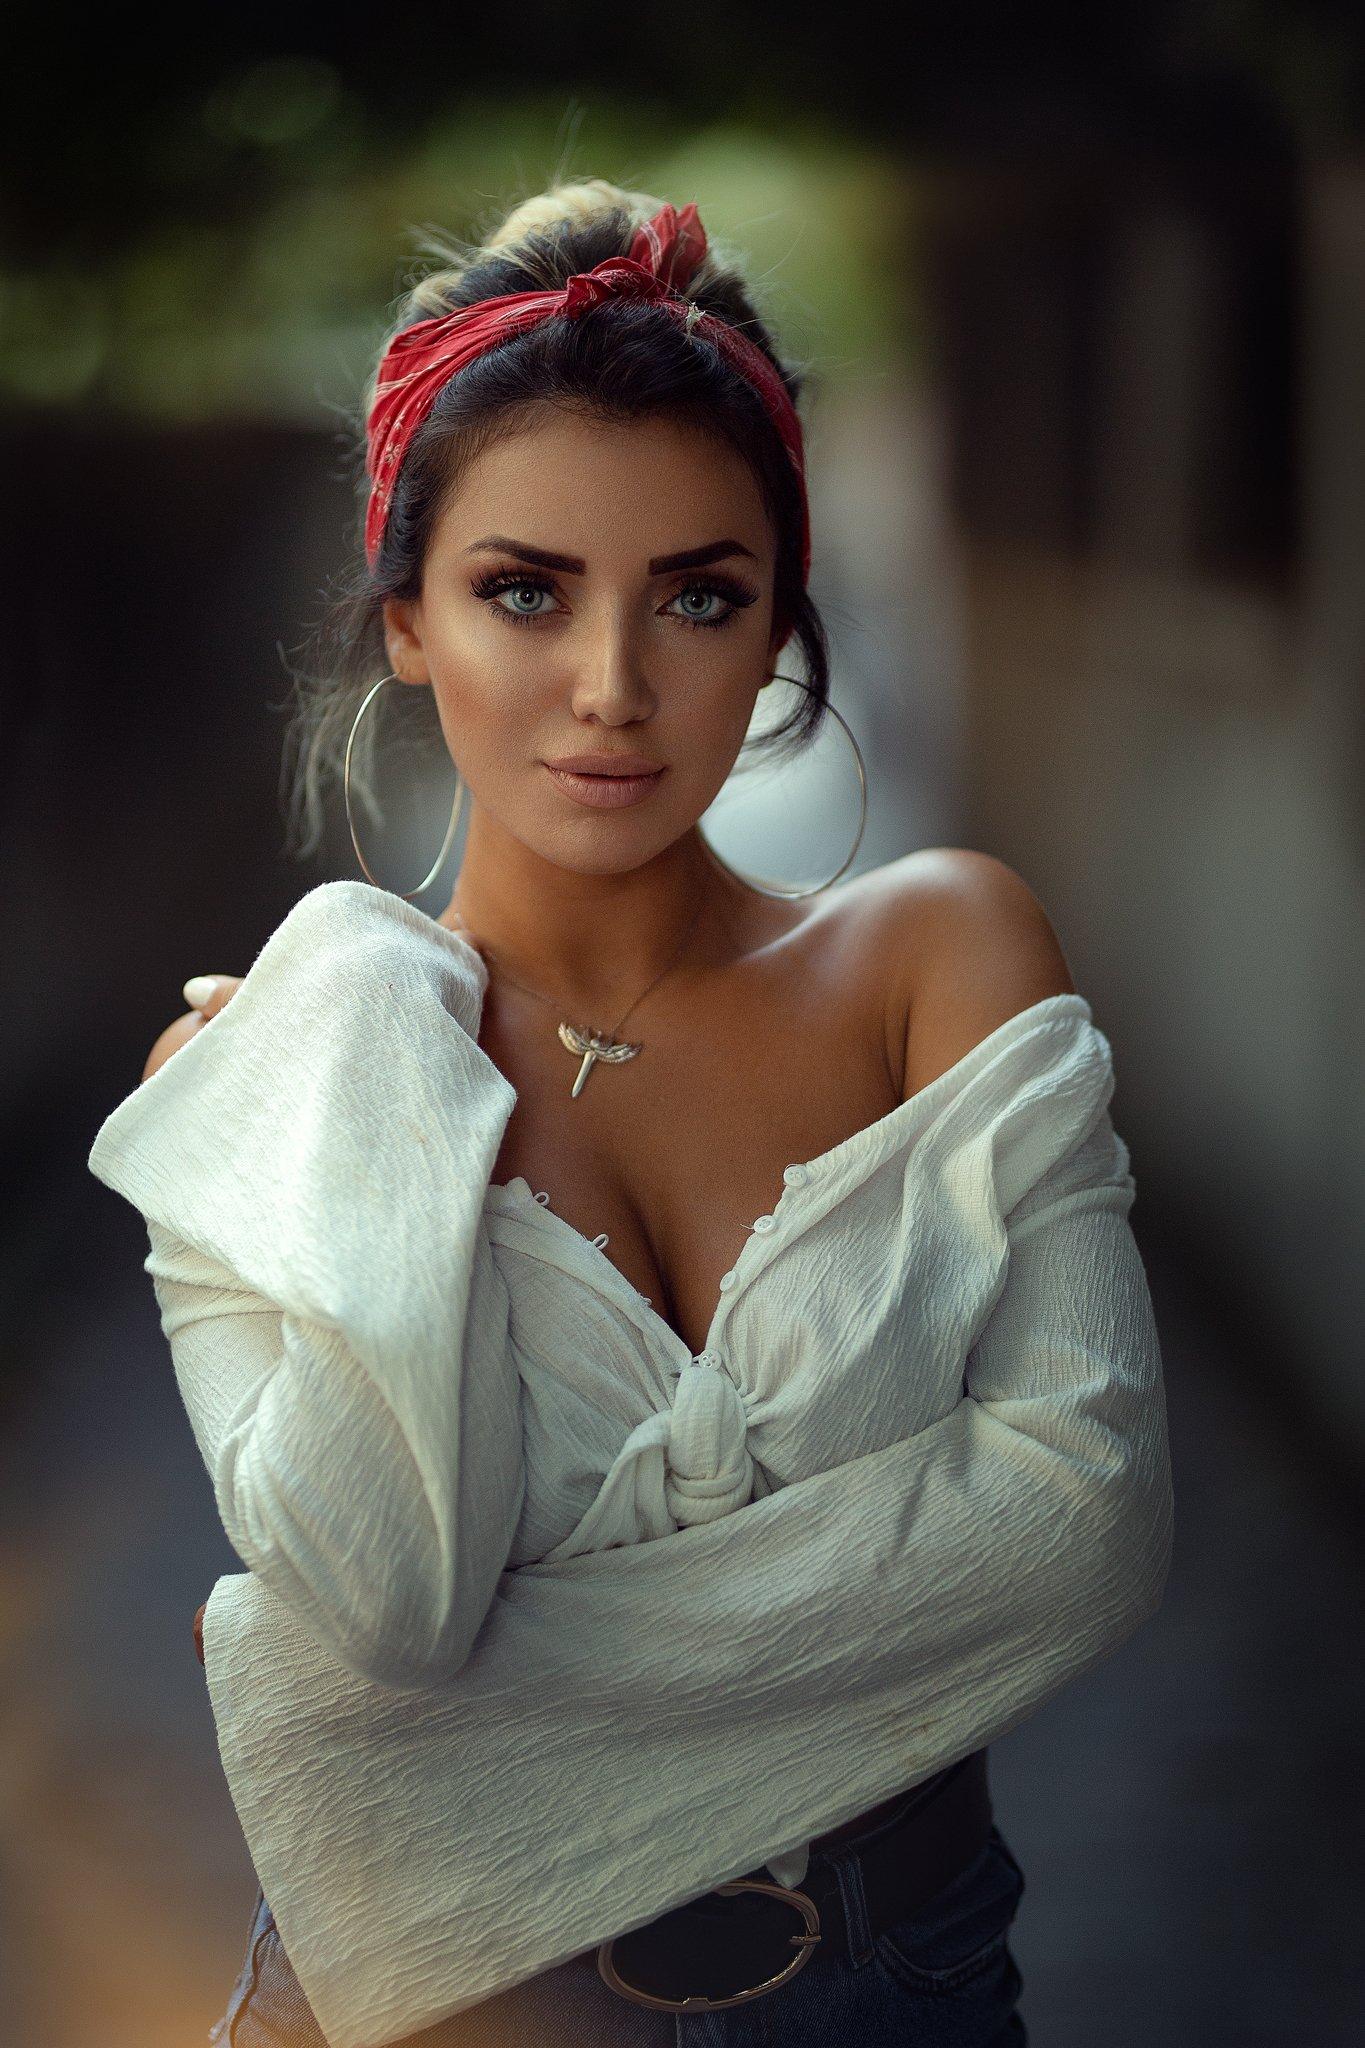 photography, canon, model, girl, nature, eyes, sigma, Анас Счастливый